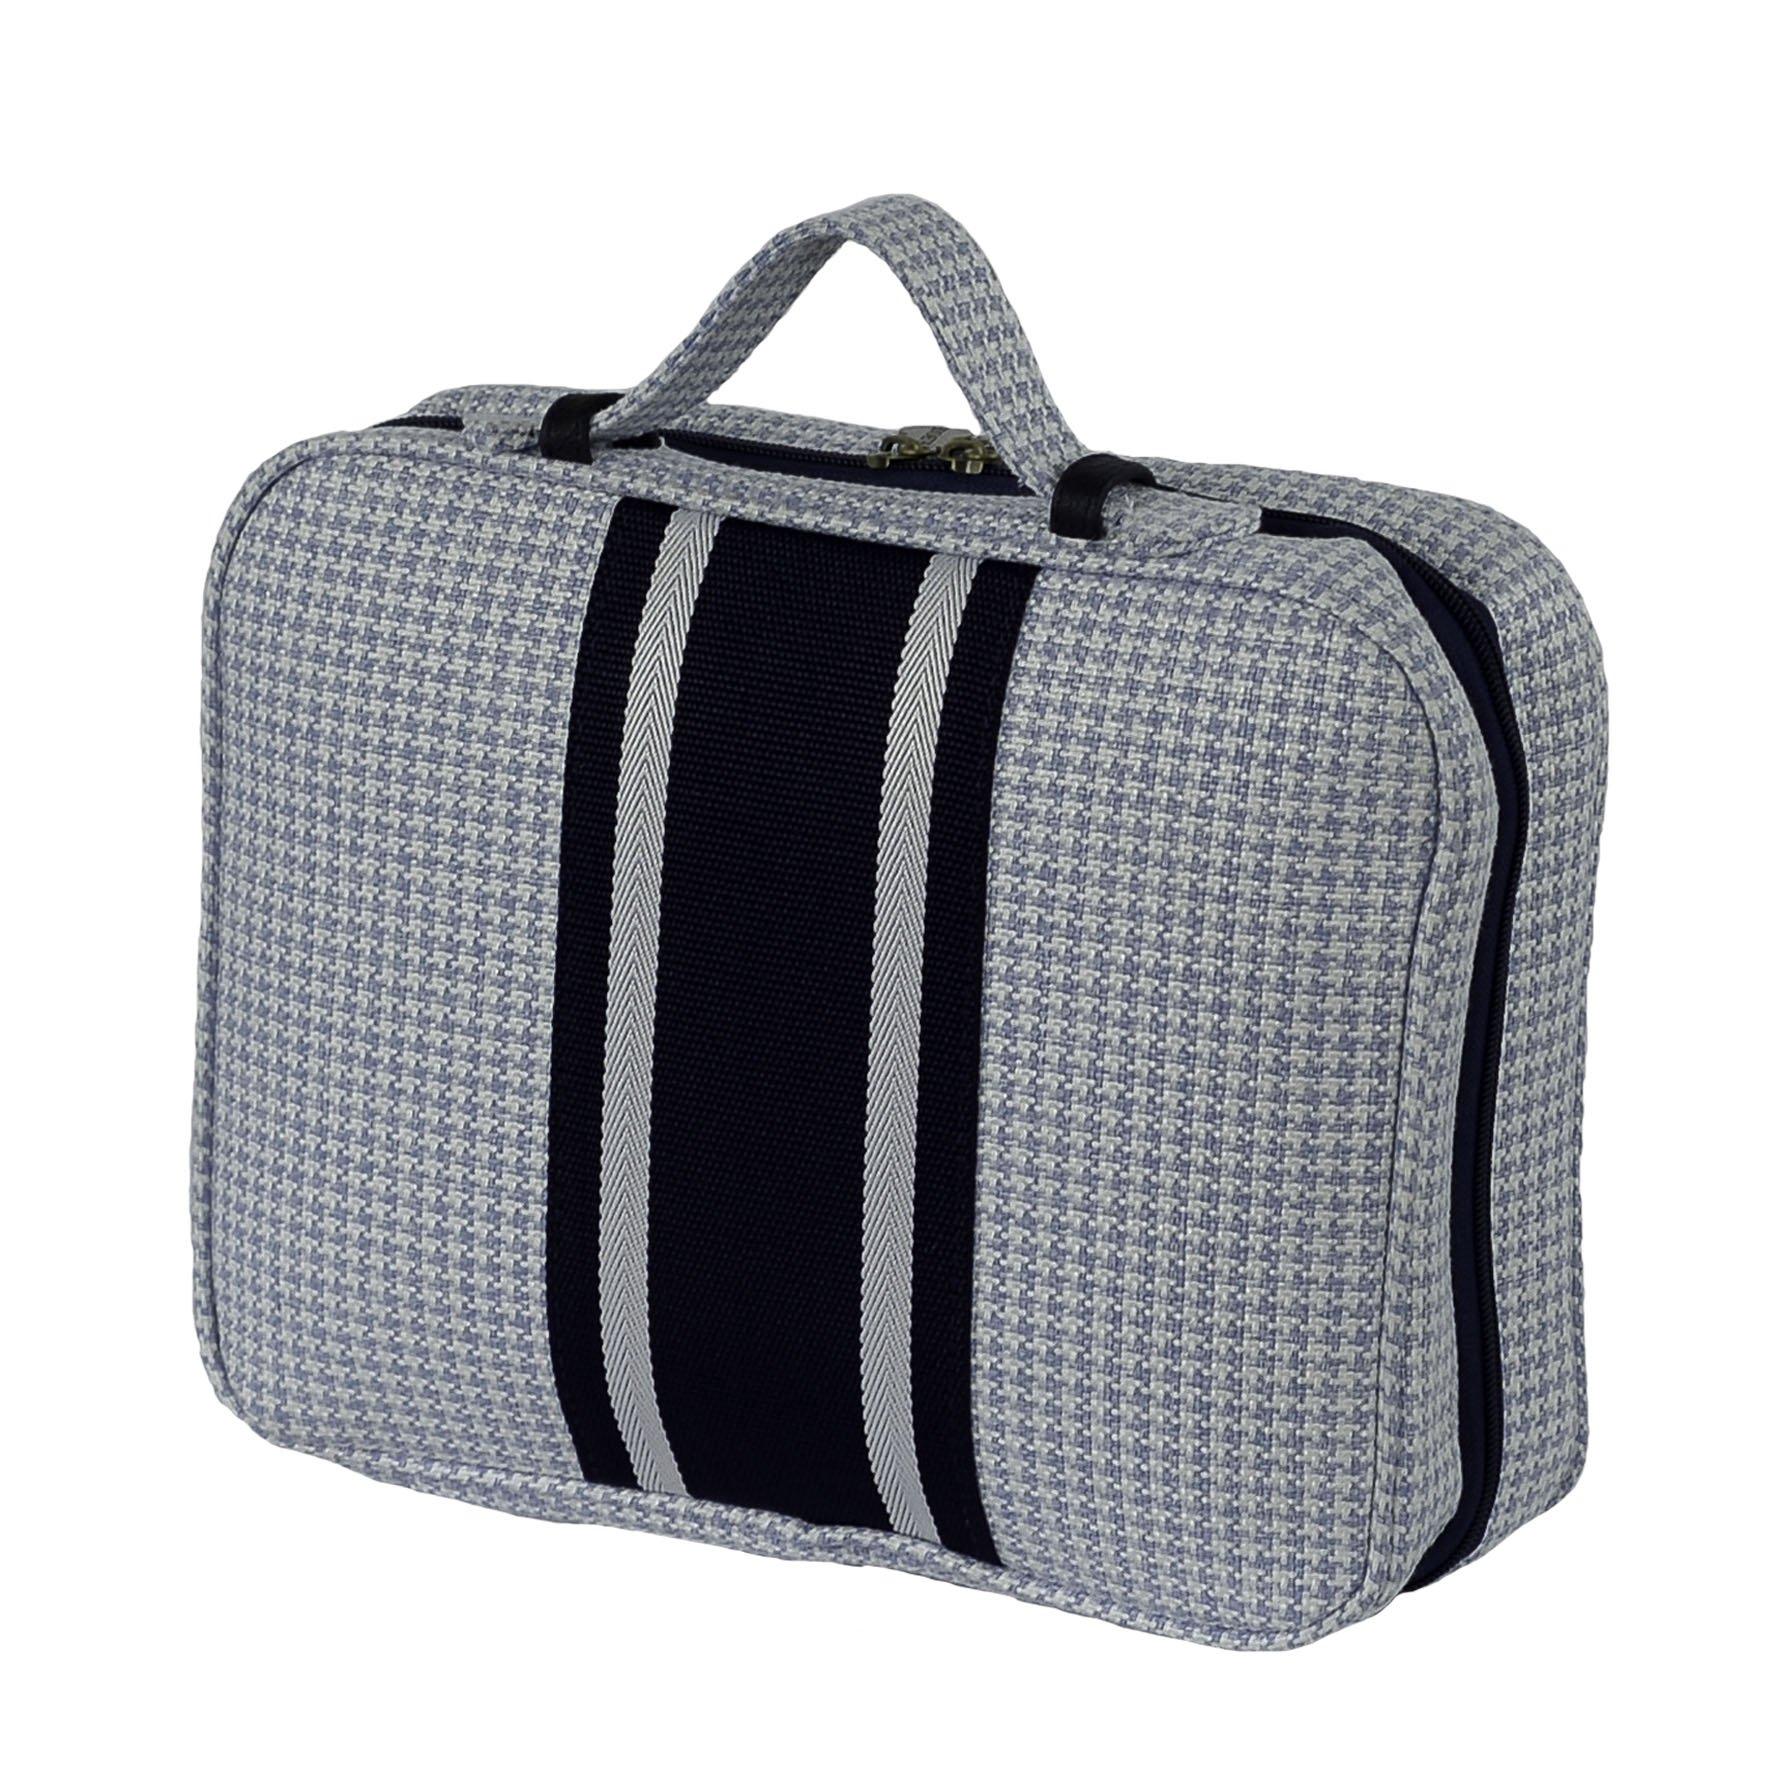 Bellemonde Hanging Toiletry Bag Travel Kit for Men and Women | Washable, Stain-resistant | Timeless Design Toiletry Organizer, Makeup Bag, Cosmetic Bag | Packs Flat 12'' x 10'' x 3.5'' | BL178PB Blue by Bellemonde (Image #2)